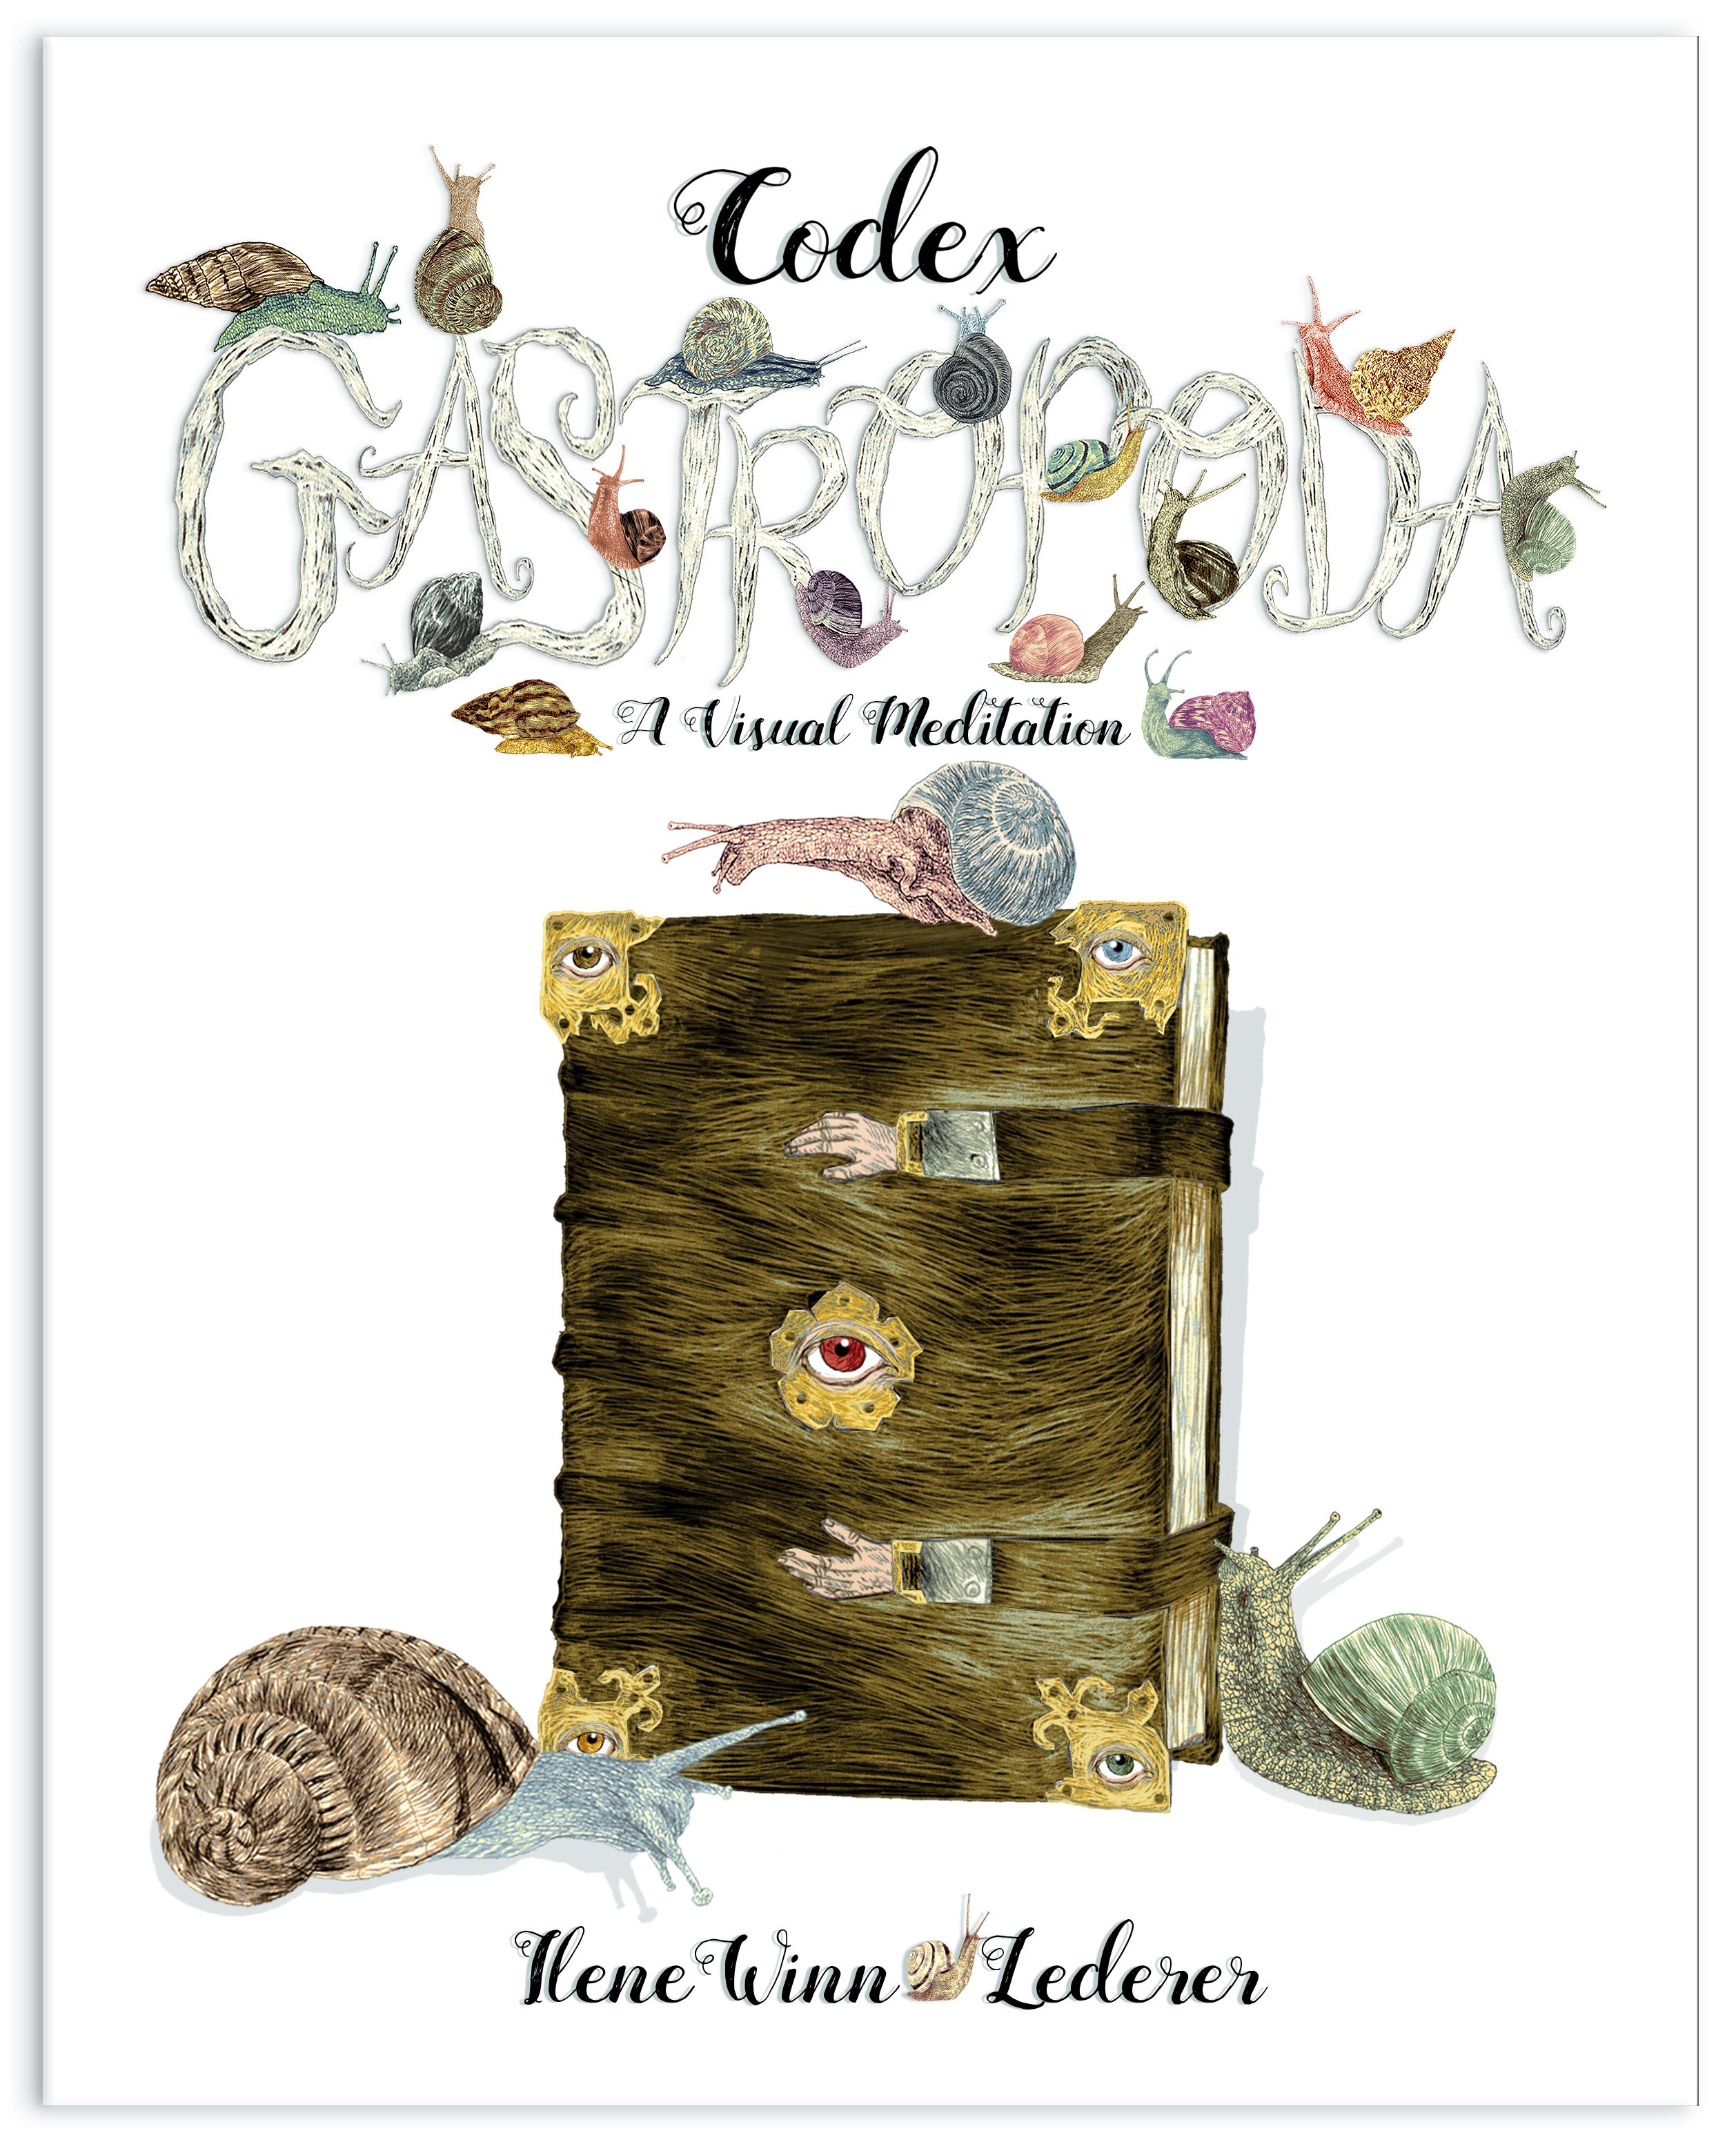 CodexGastropoda-Cover-FLATFINAL.jpg